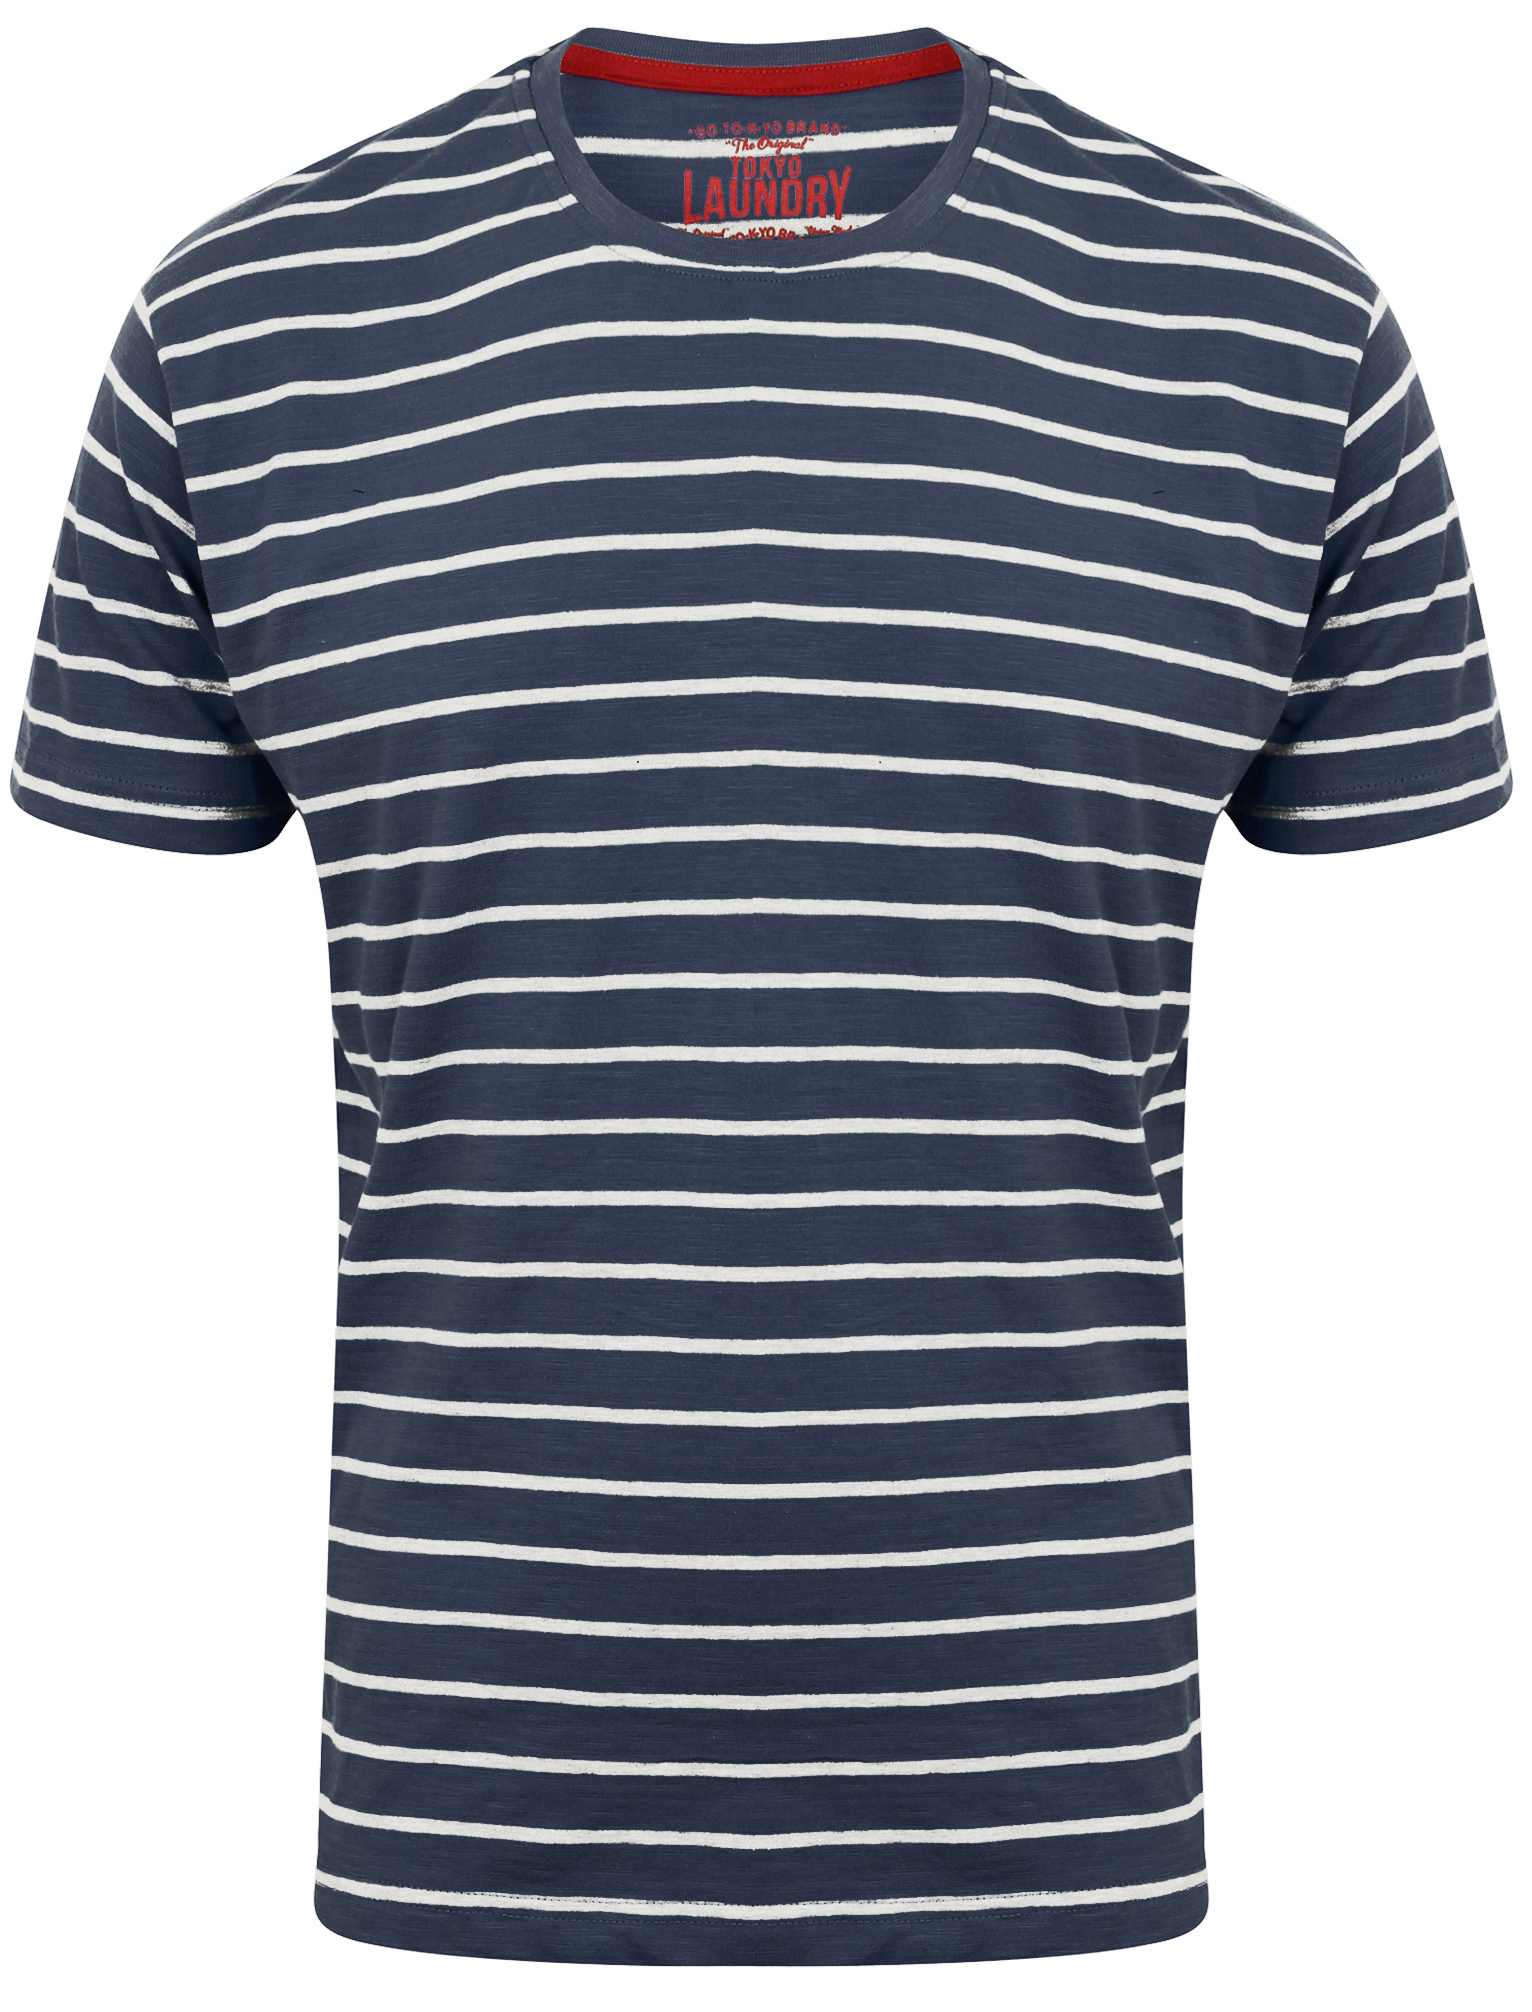 Tokyo-Laundry-Men-039-s-Gough-Cotton-Short-Sleeve-Pyjamas-PJ-Shorts-Lounge-Wear-Set thumbnail 3